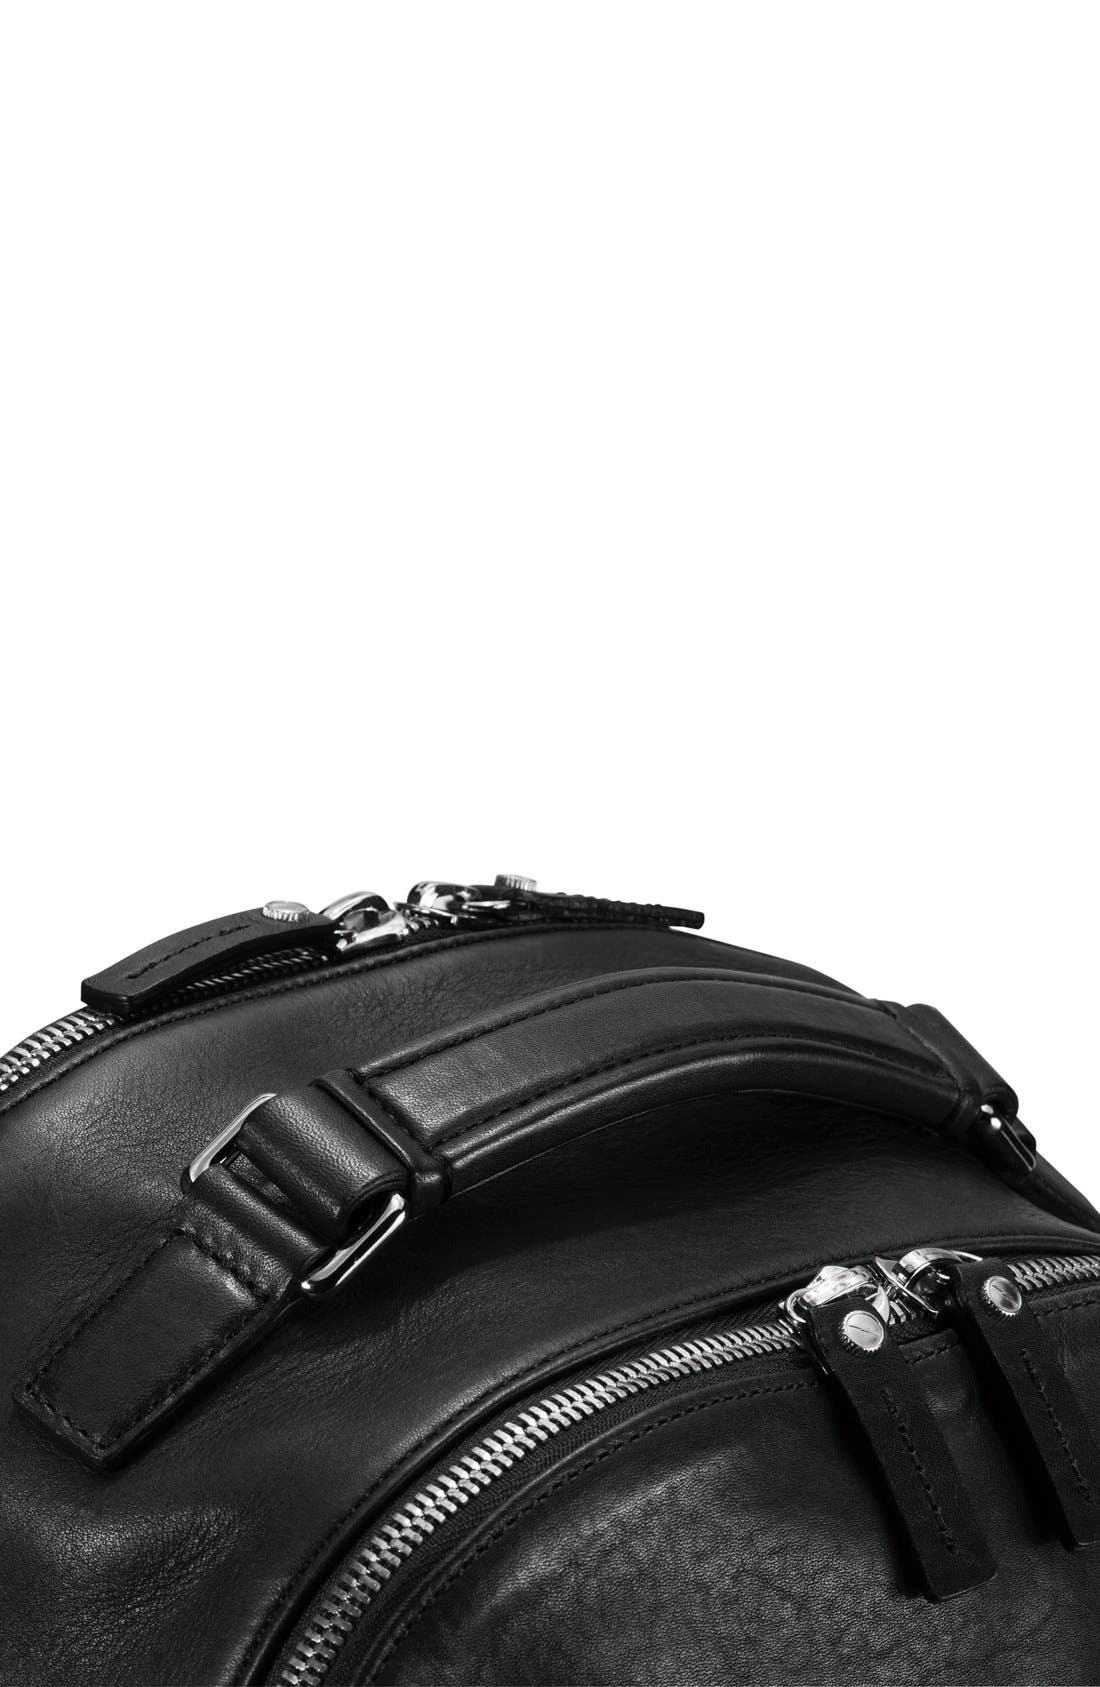 Runwell Leather Laptop Backpack,                             Alternate thumbnail 7, color,                             Black